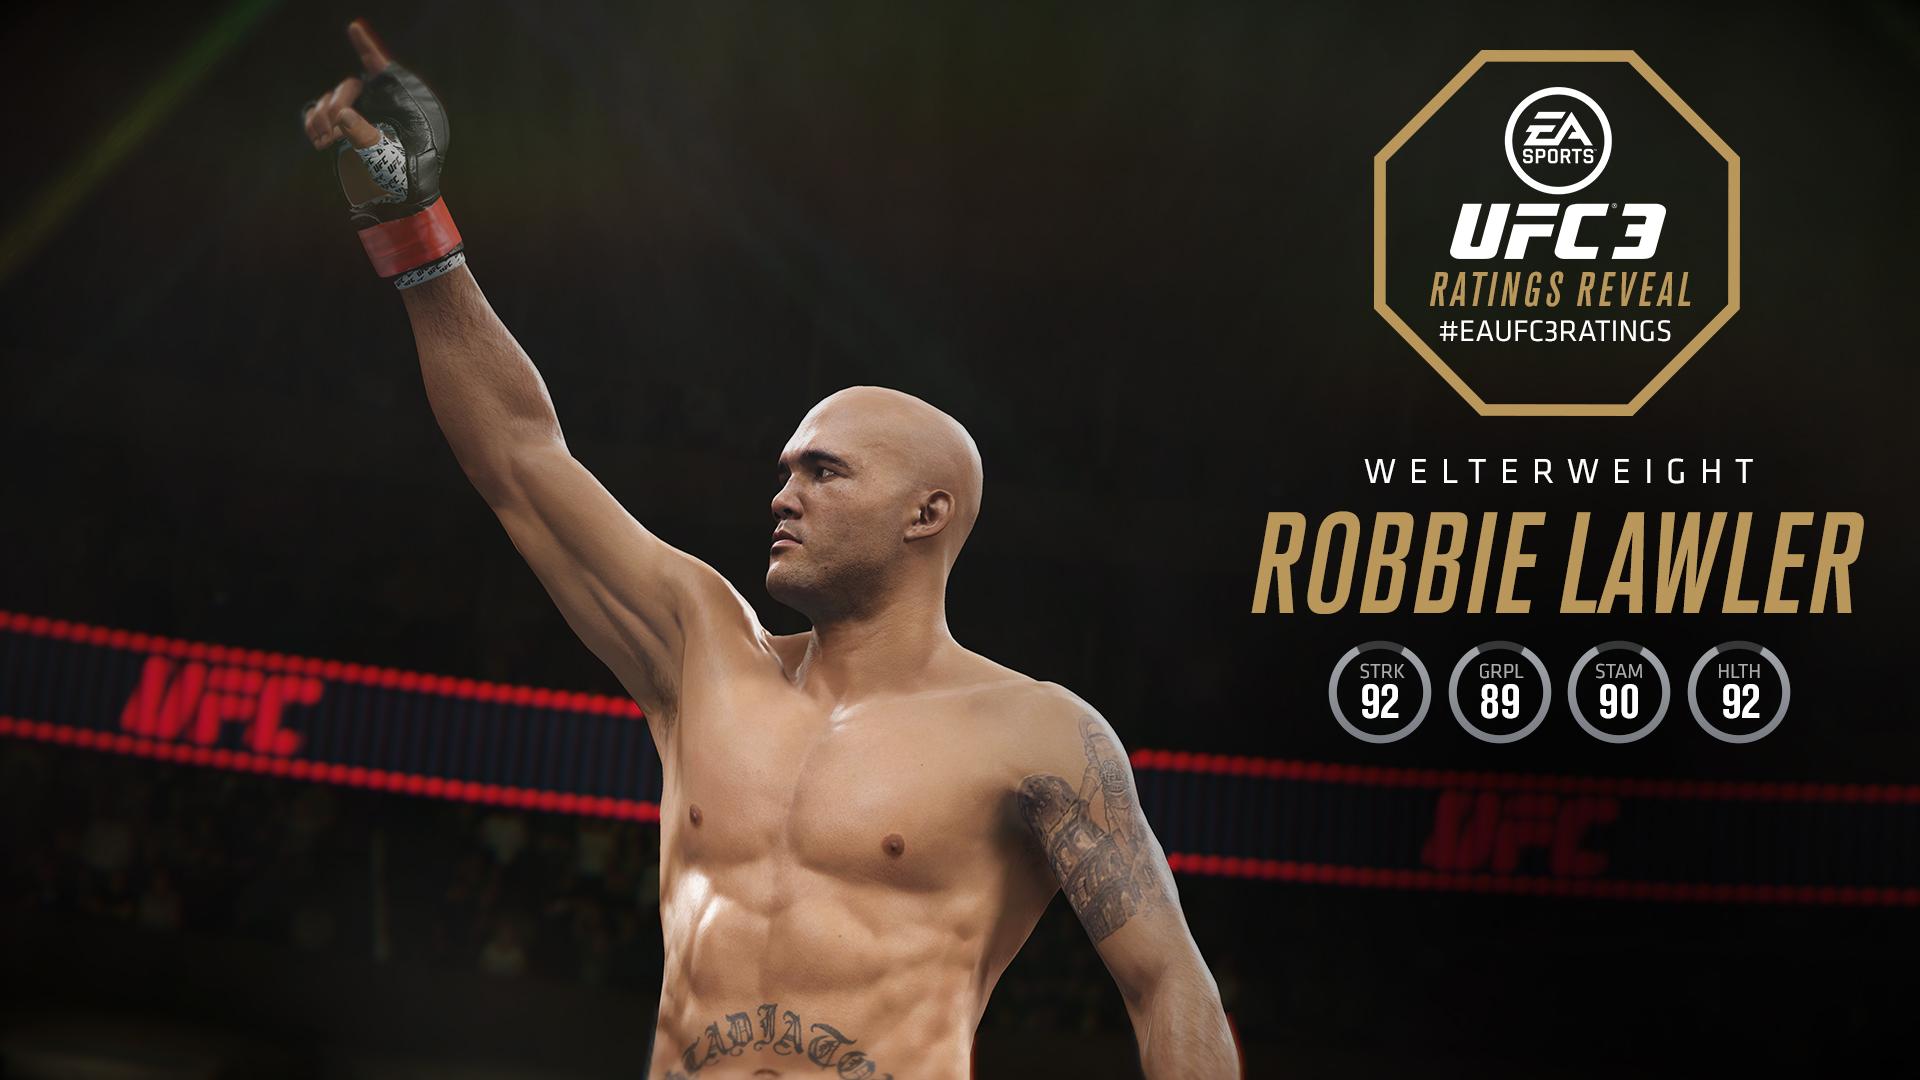 RobbieLawler_Welterweight_1920x1080